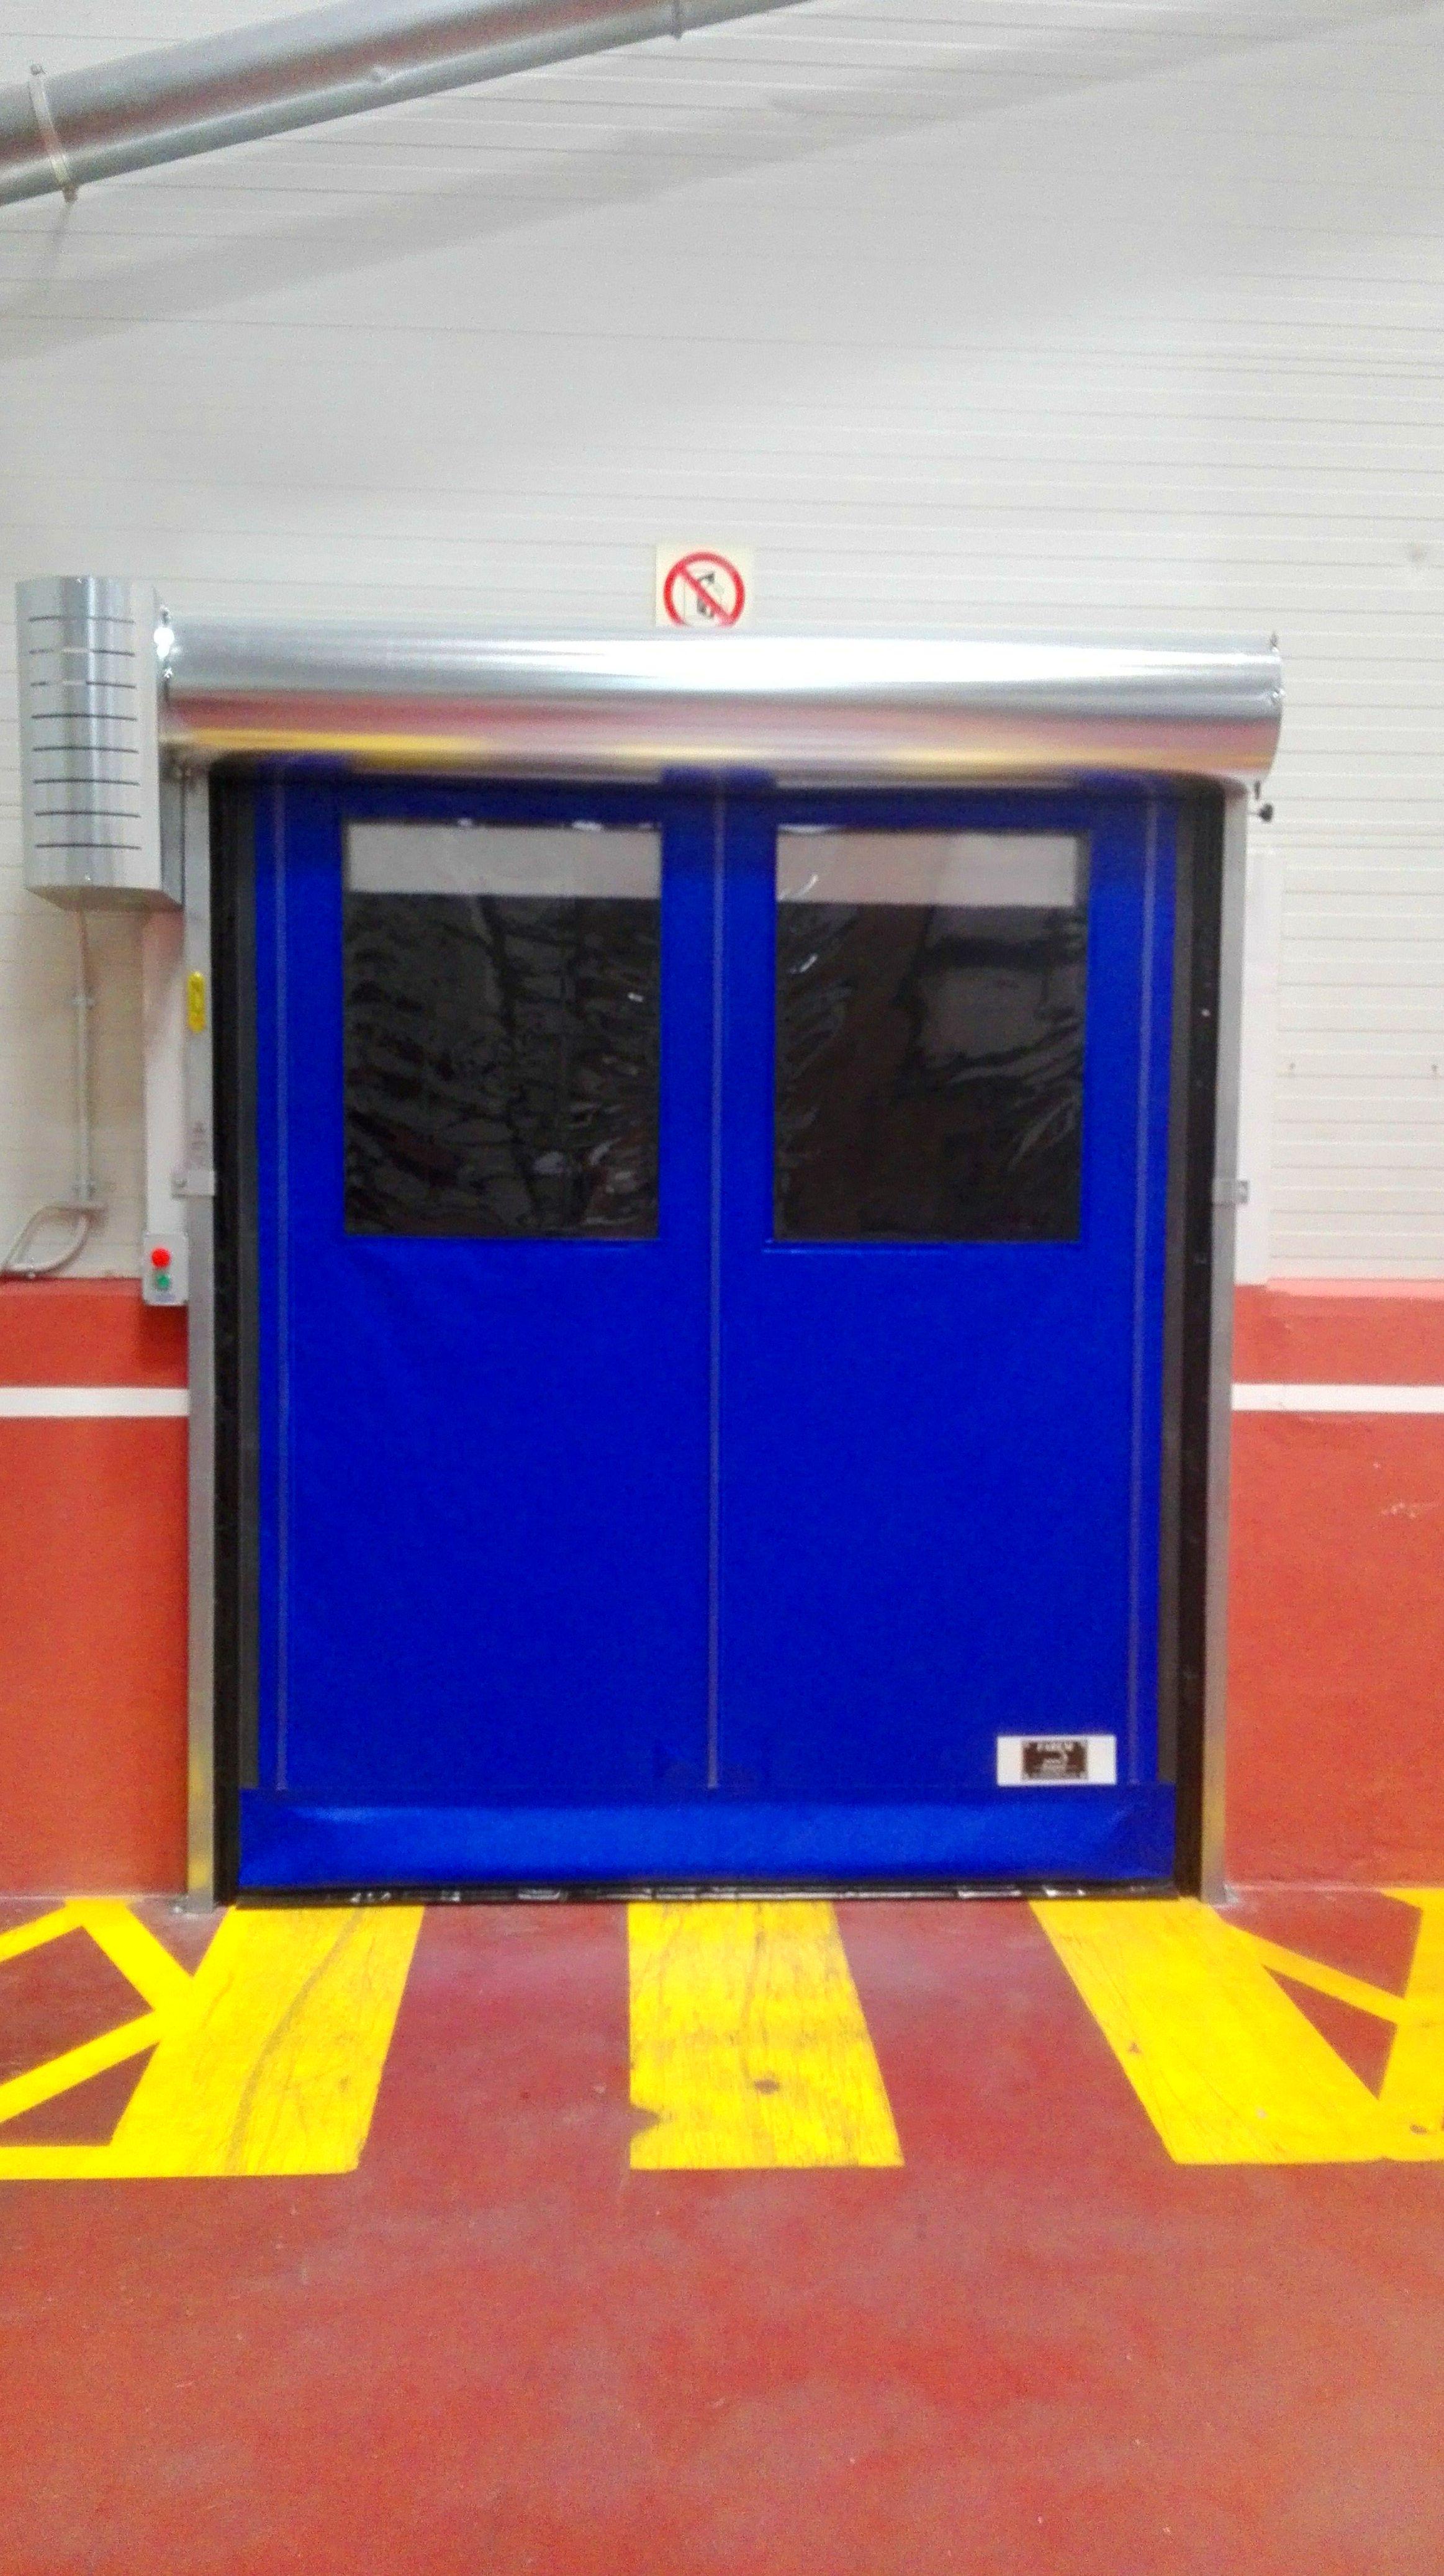 Puerta rápida enrollable autofull autorreparable Faremgies3